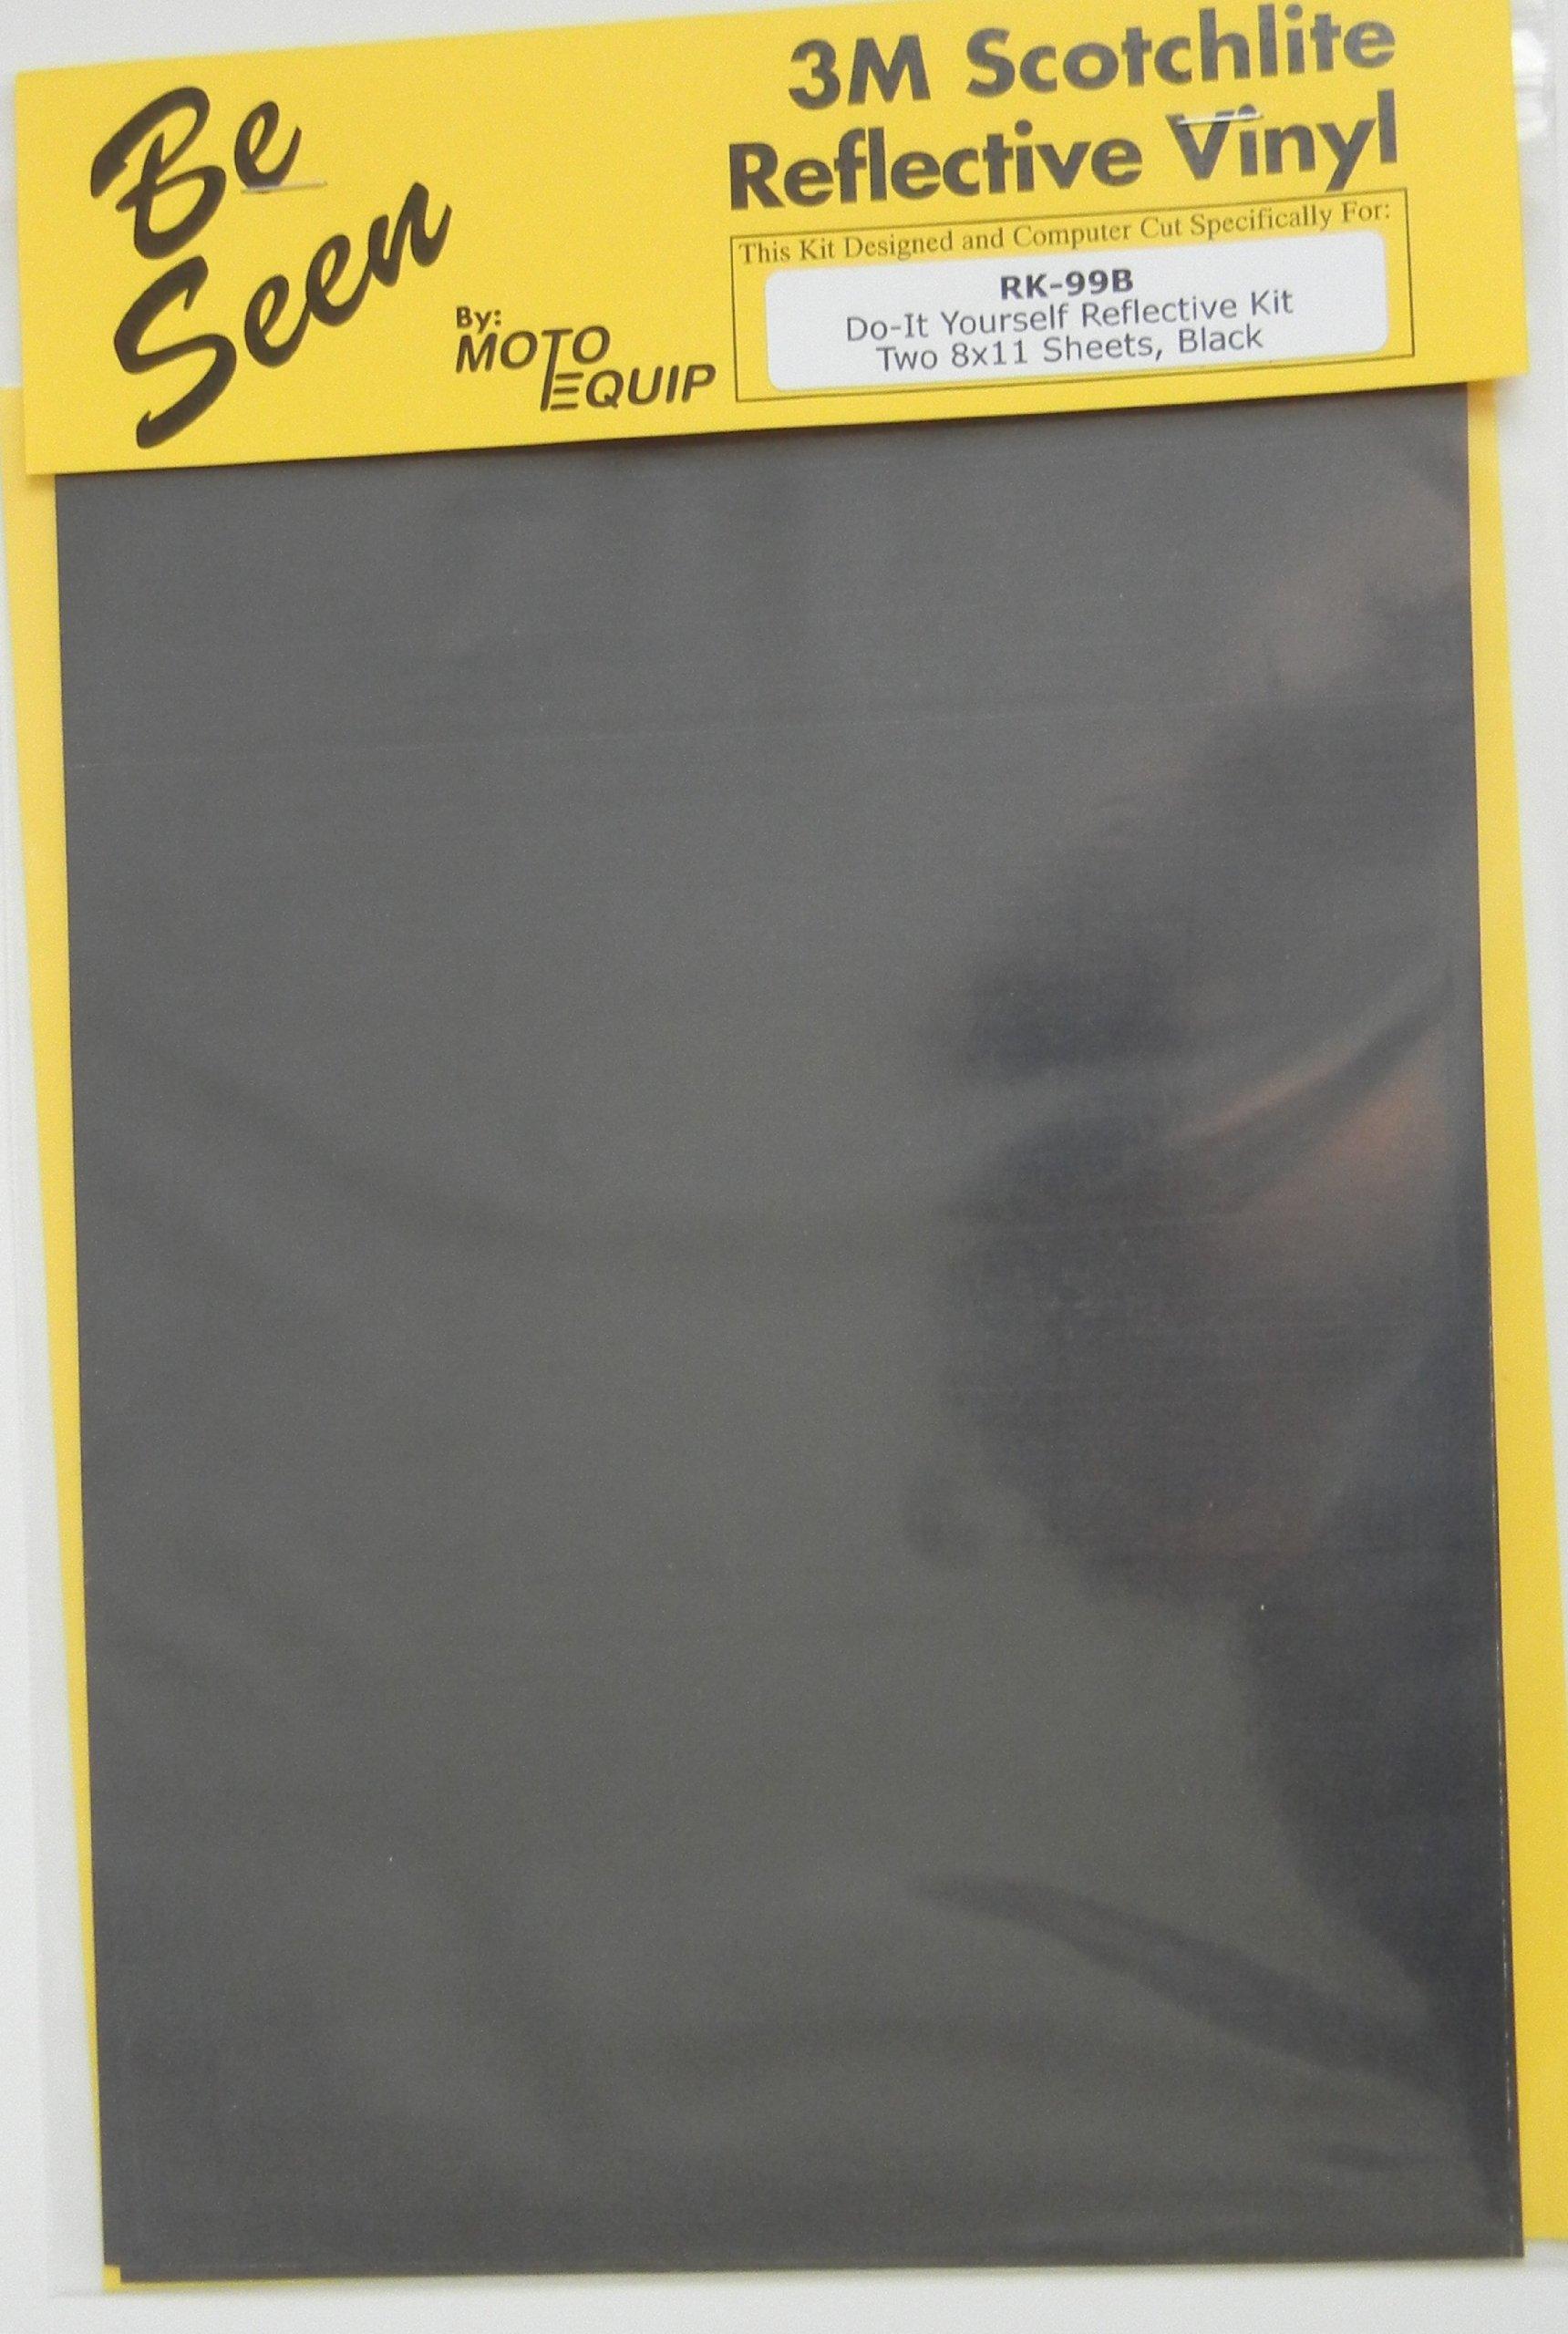 Motorcycle Black Reflective Tape 3M Scotchlite DYI Kit ME RK-99